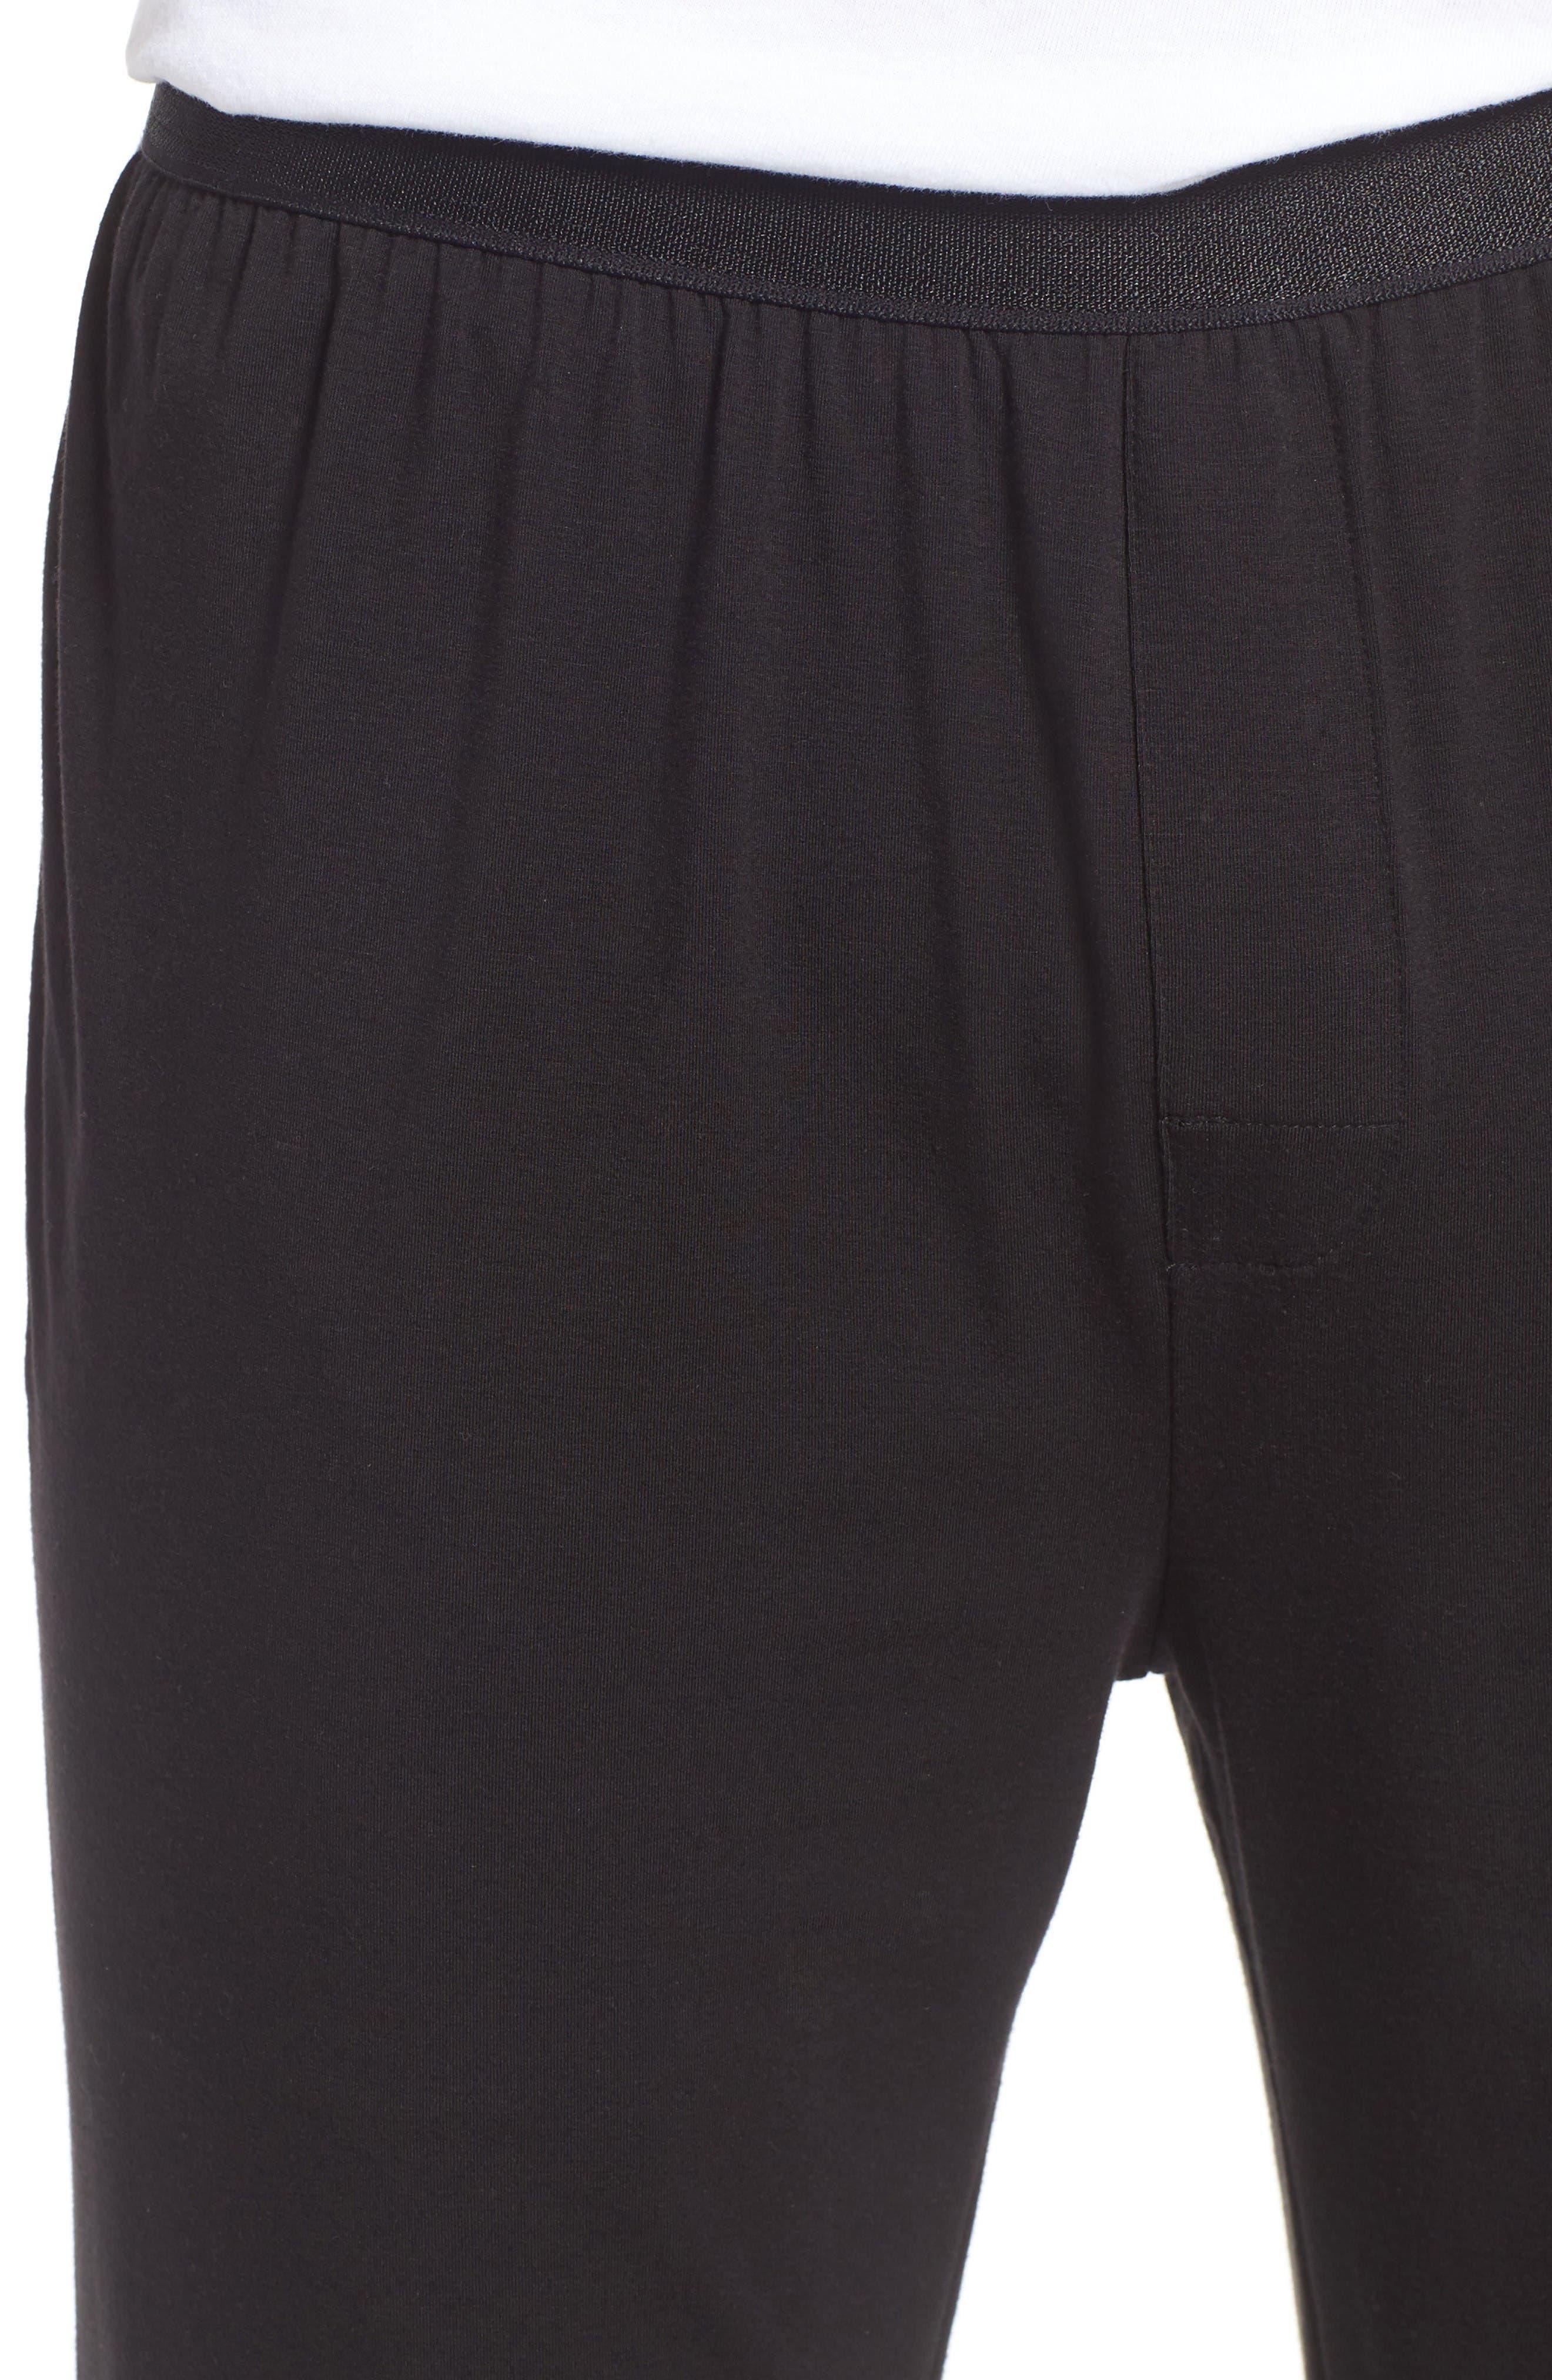 Micromodal Blend Lounge Pants,                             Alternate thumbnail 4, color,                             Black